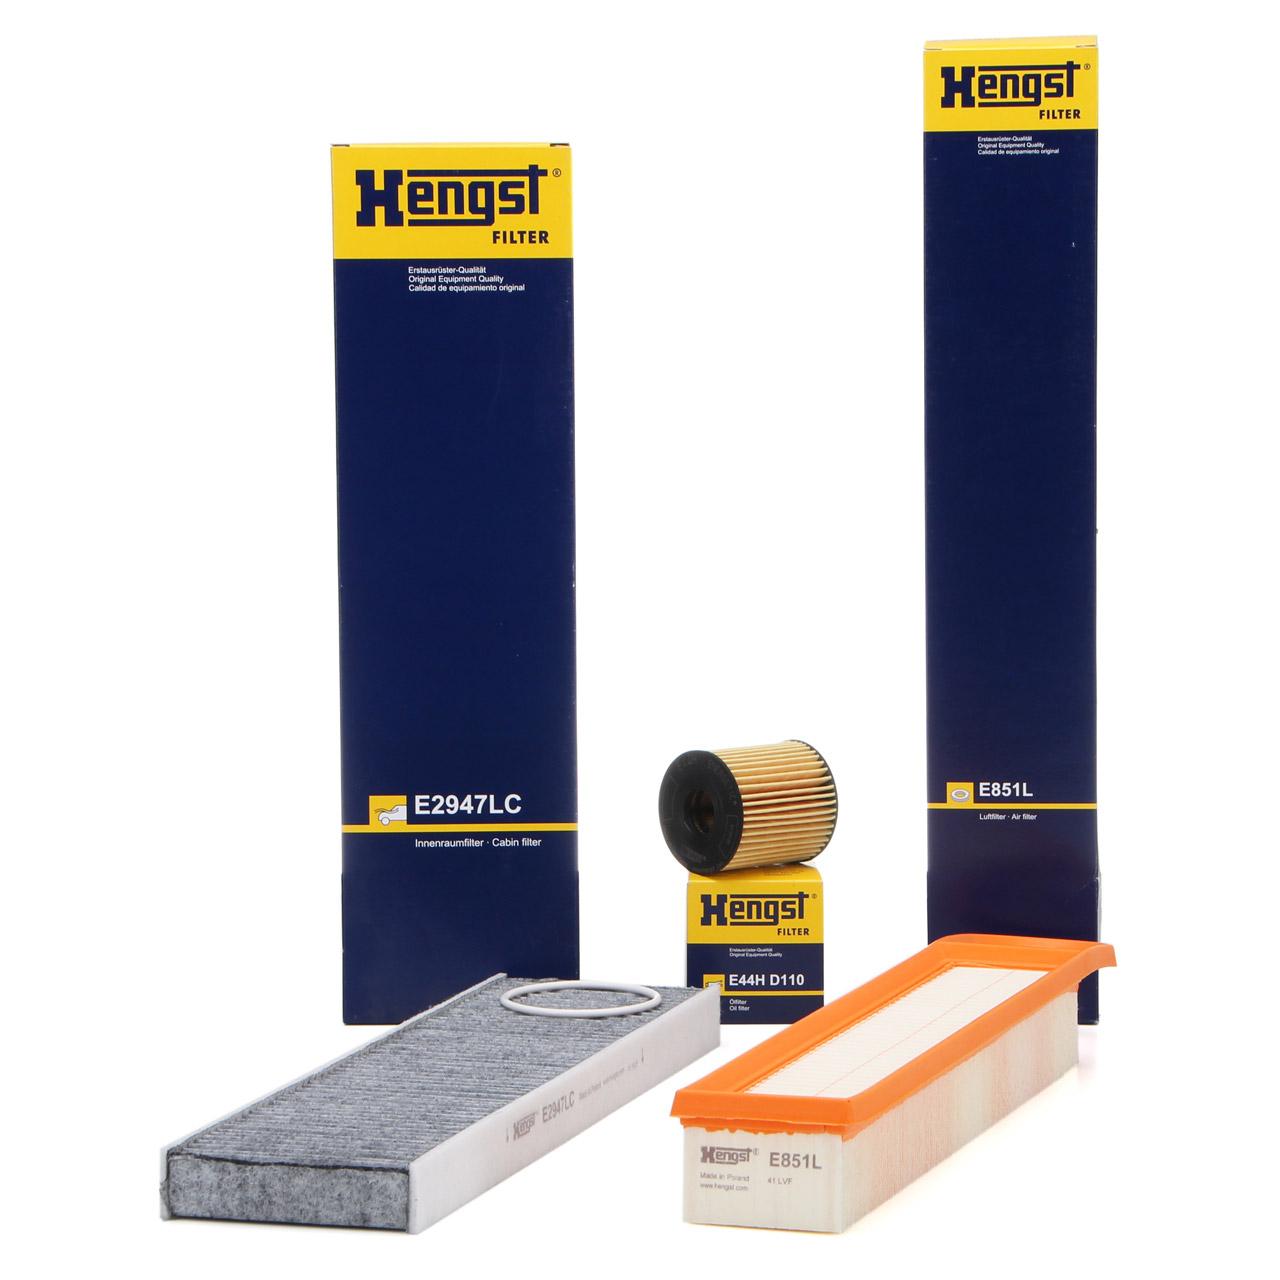 HENGST Filterset MINI R55 R56 R57 R58 R59 R60 R61 One / Cooper 75-122 PS N12 N16